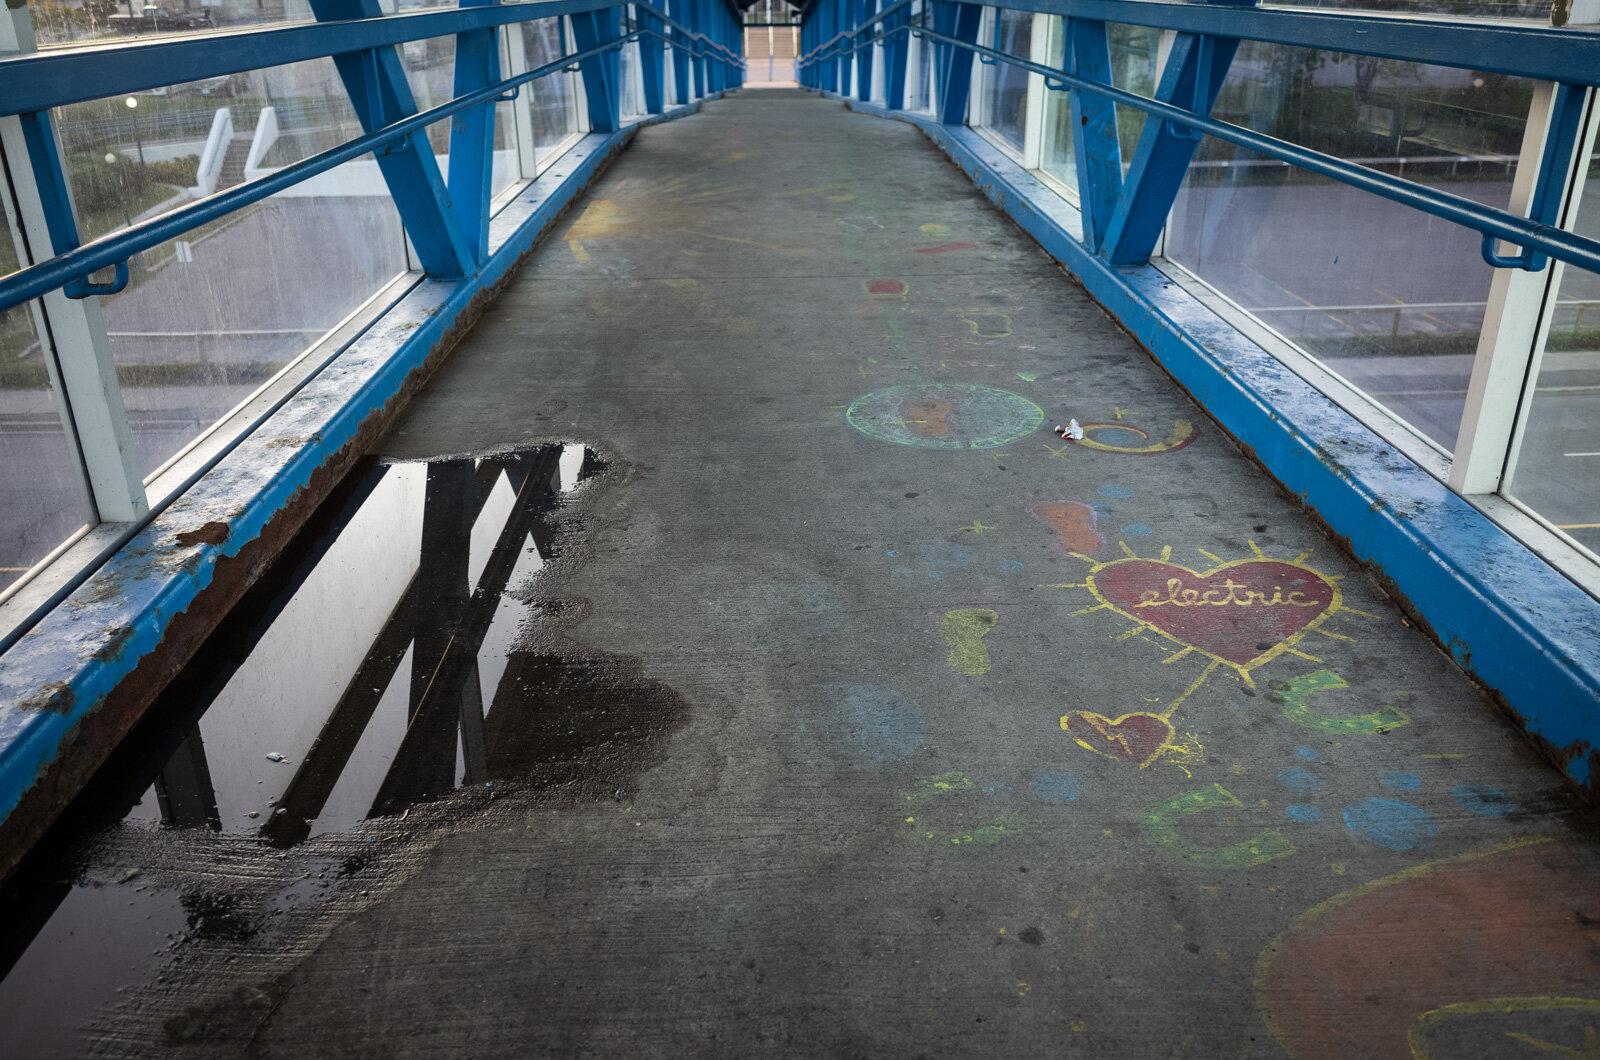 walk-after-gym-marina-blog-28.jpg